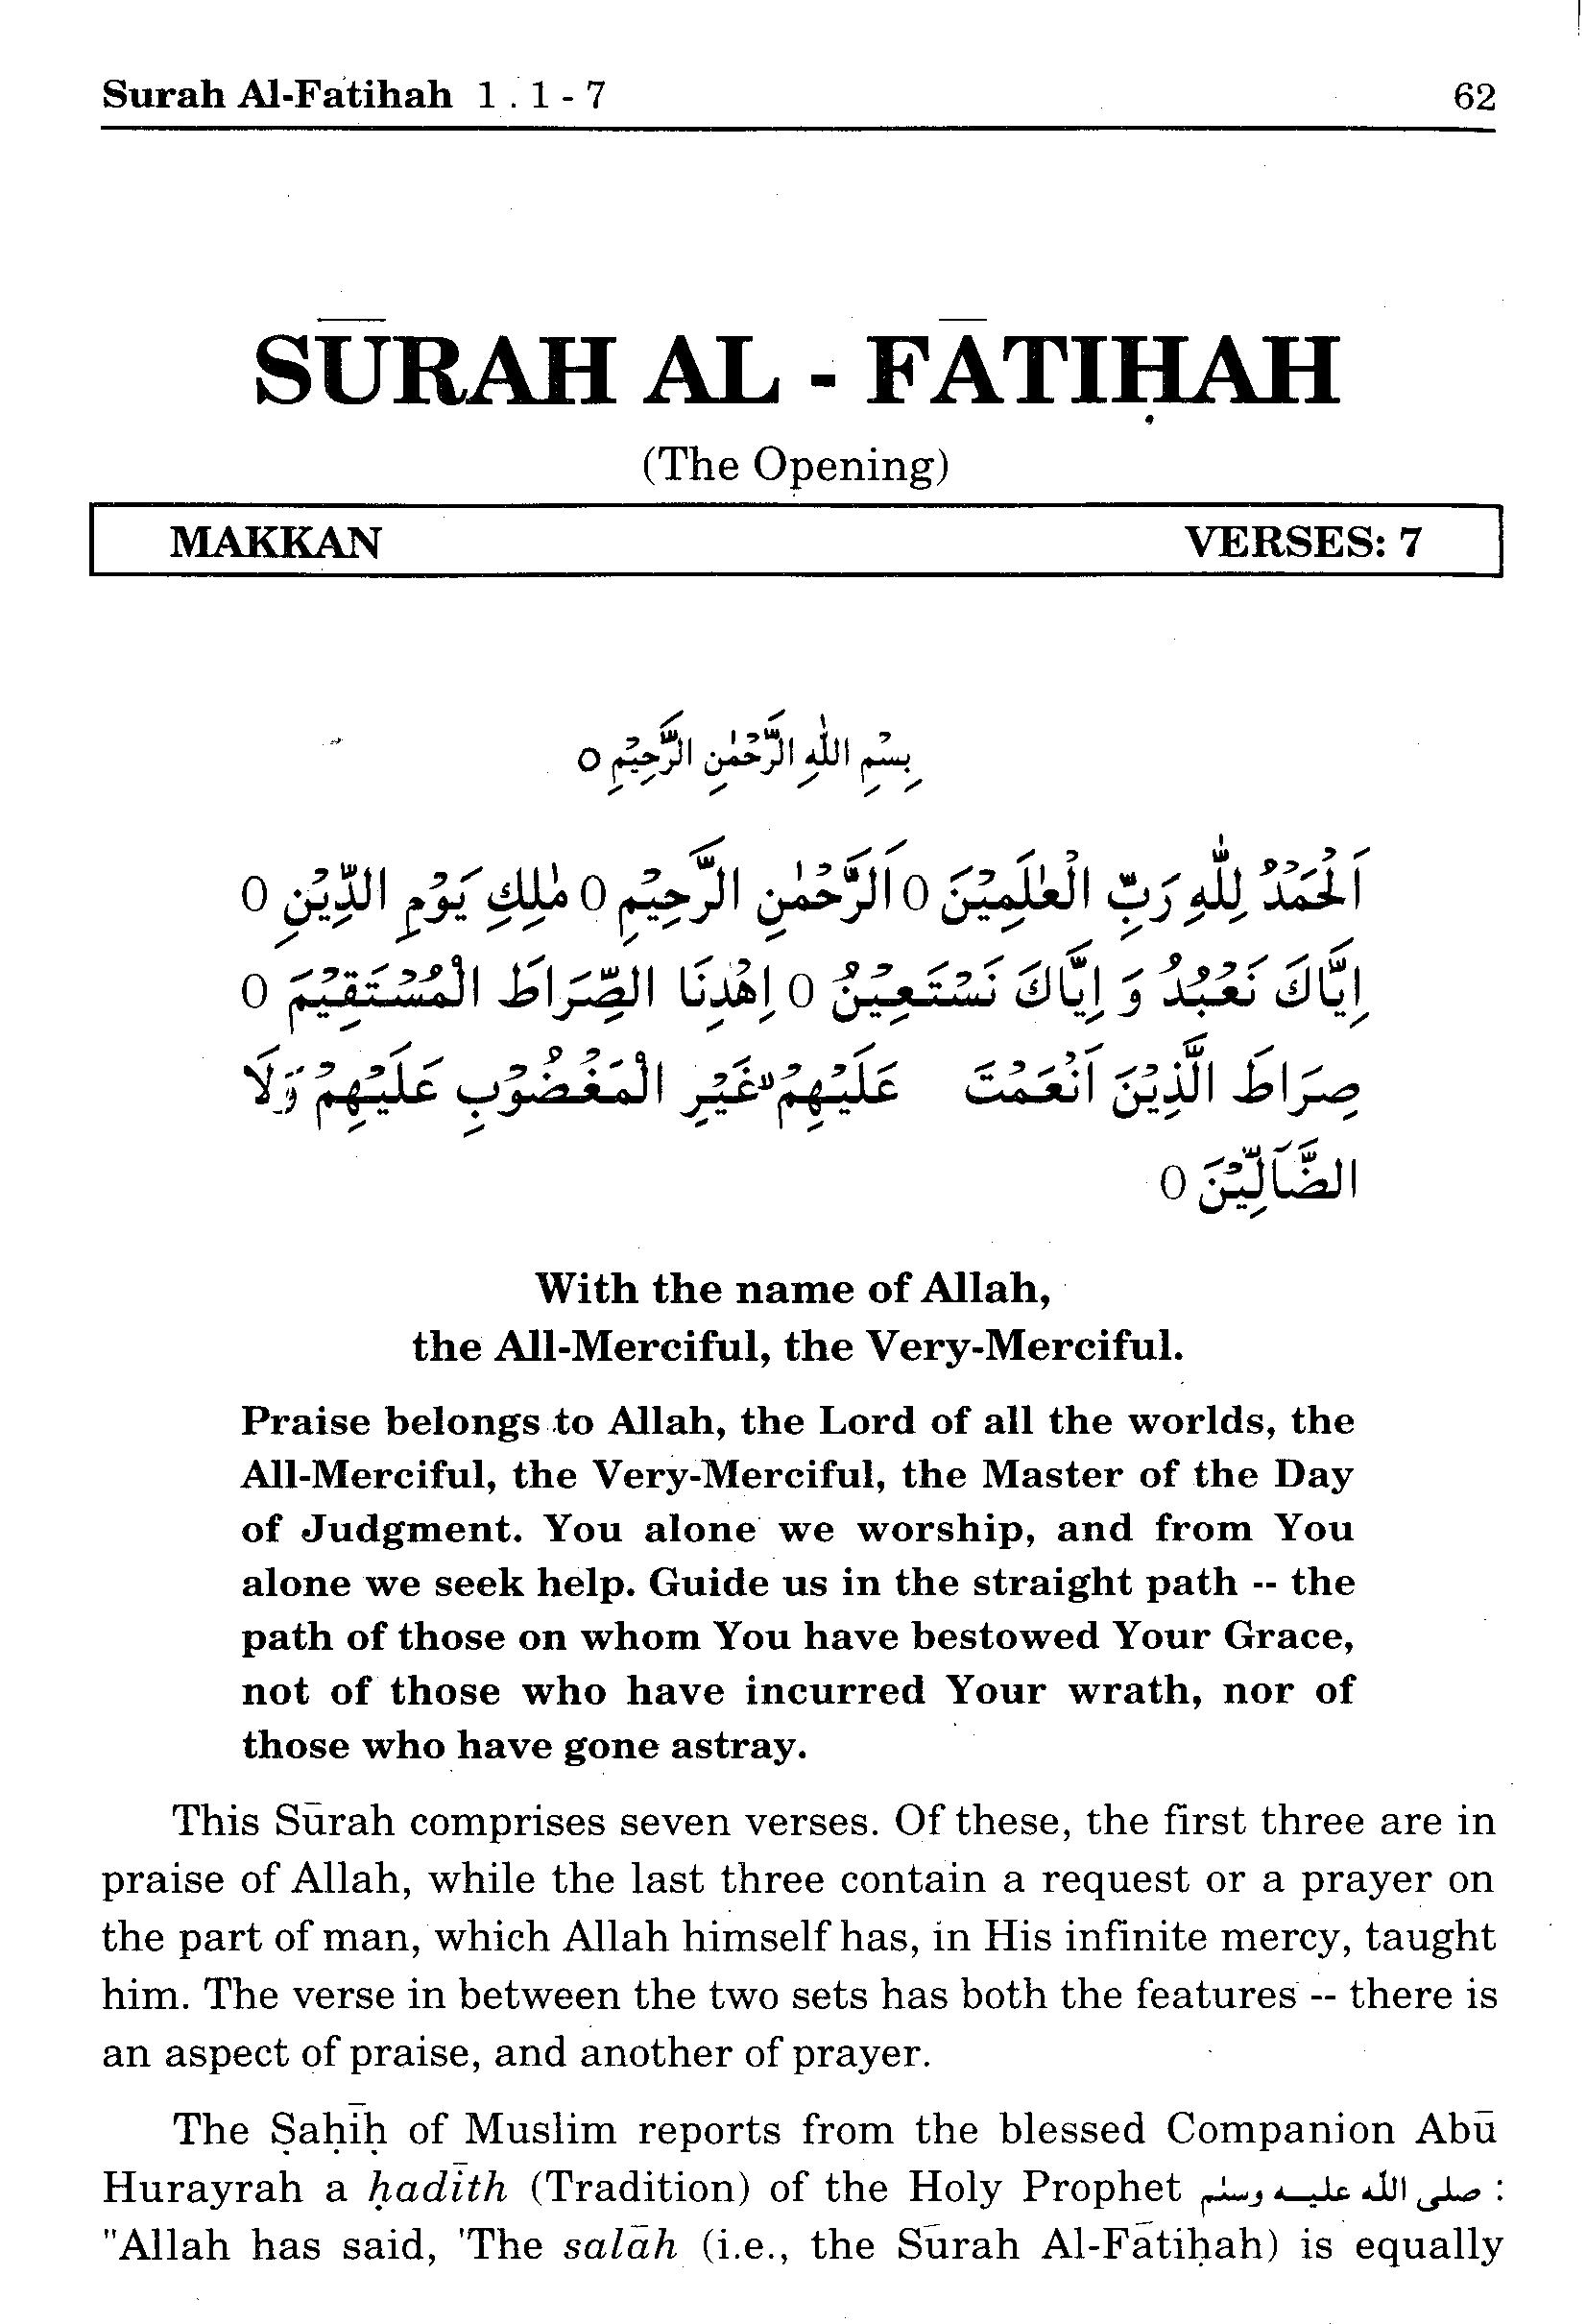 Surah Al Fathiha 1 1 7 Maariful Quran Maarif Ul Quran Quran Translation And Commentary